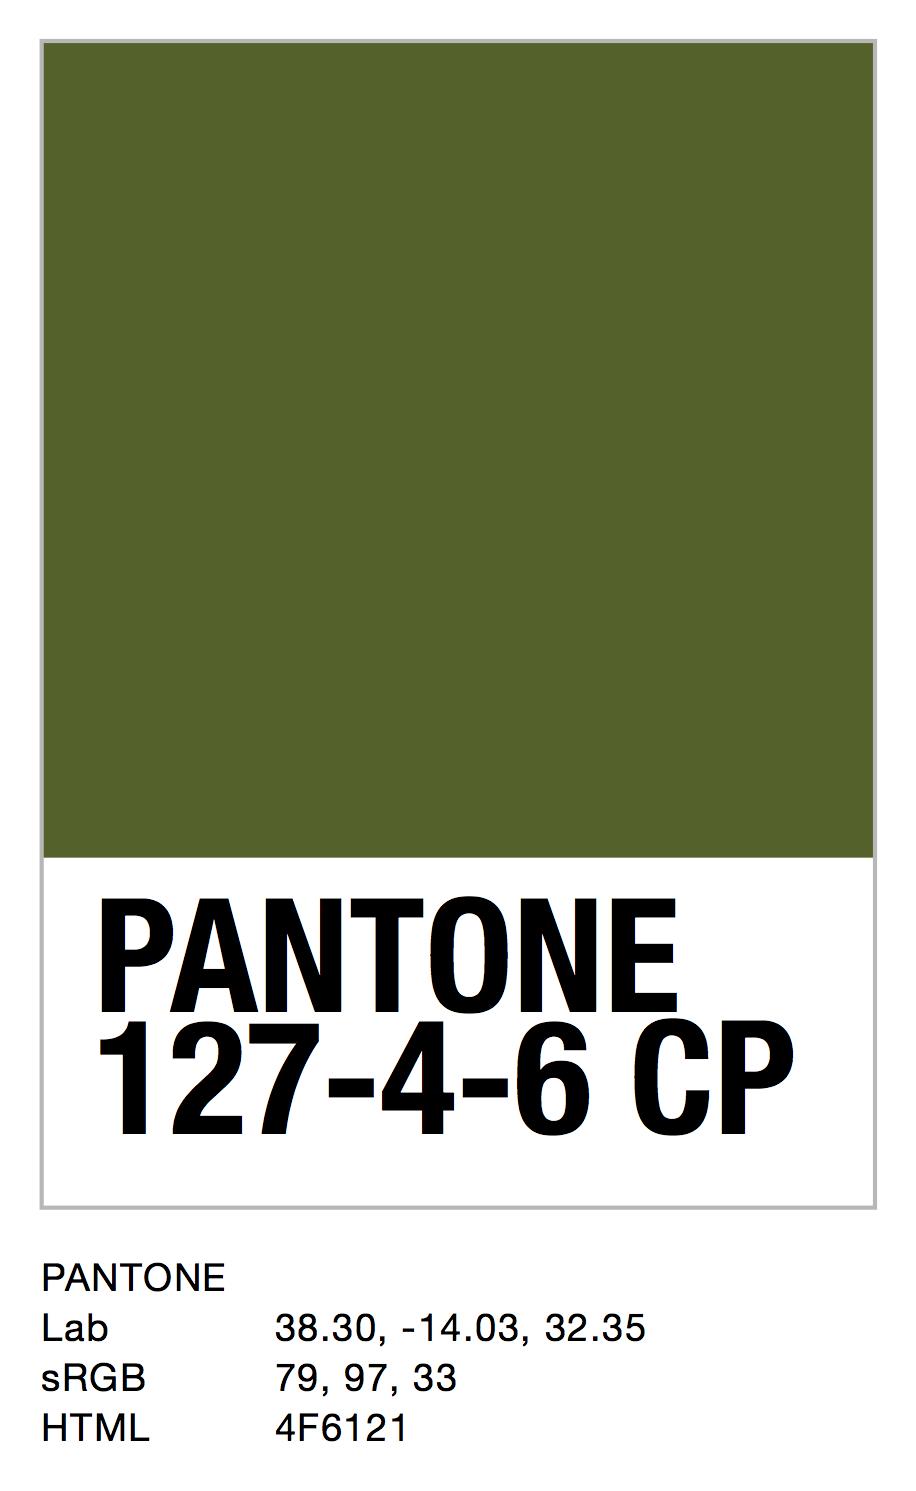 PANTONE 127-4-6 CP.jpg